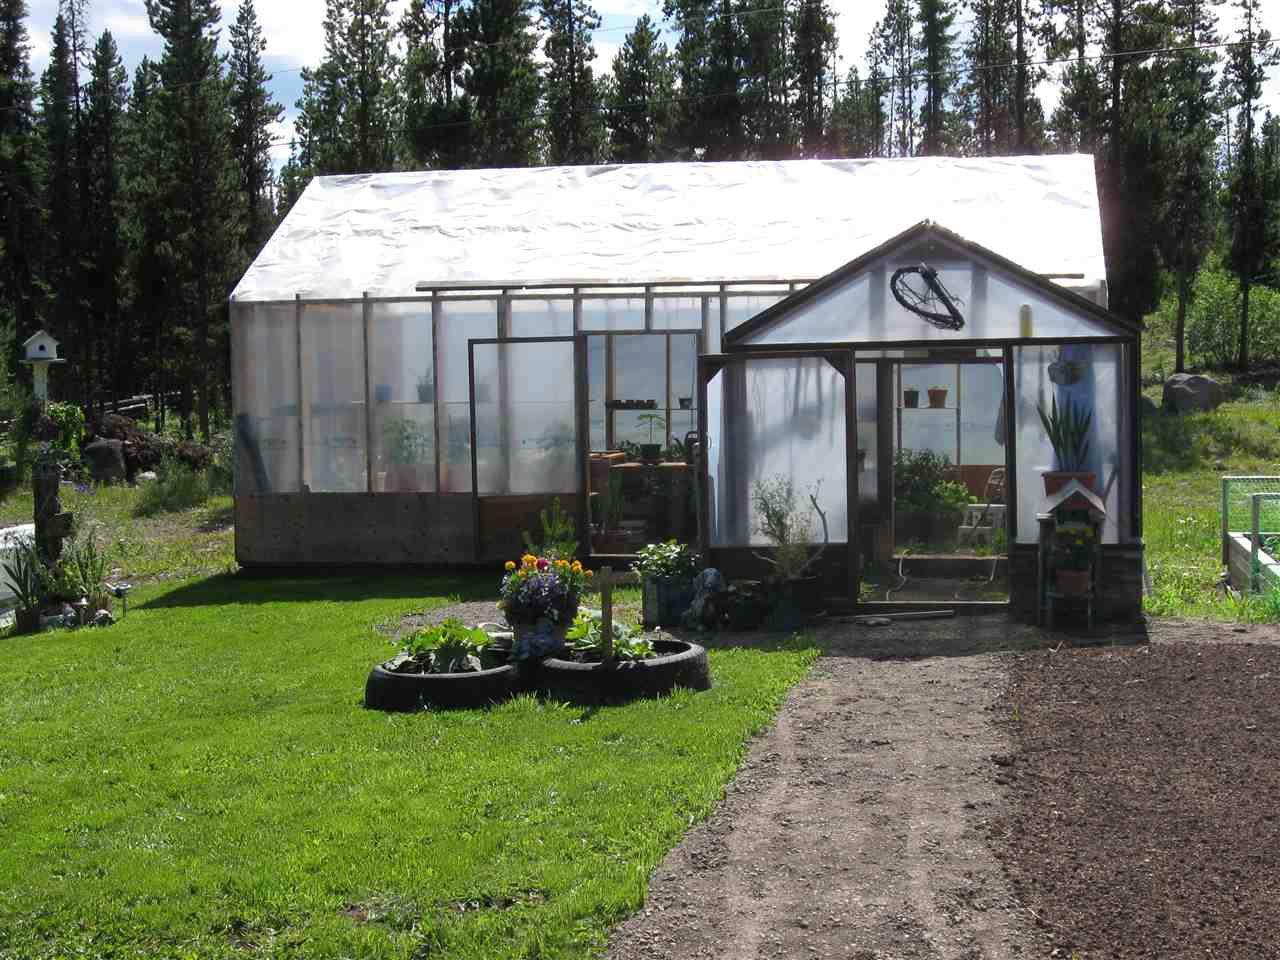 Photo 11: Photos: 3126 ELSEY Road in Williams Lake: Williams Lake - Rural West House for sale (Williams Lake (Zone 27))  : MLS®# R2467730